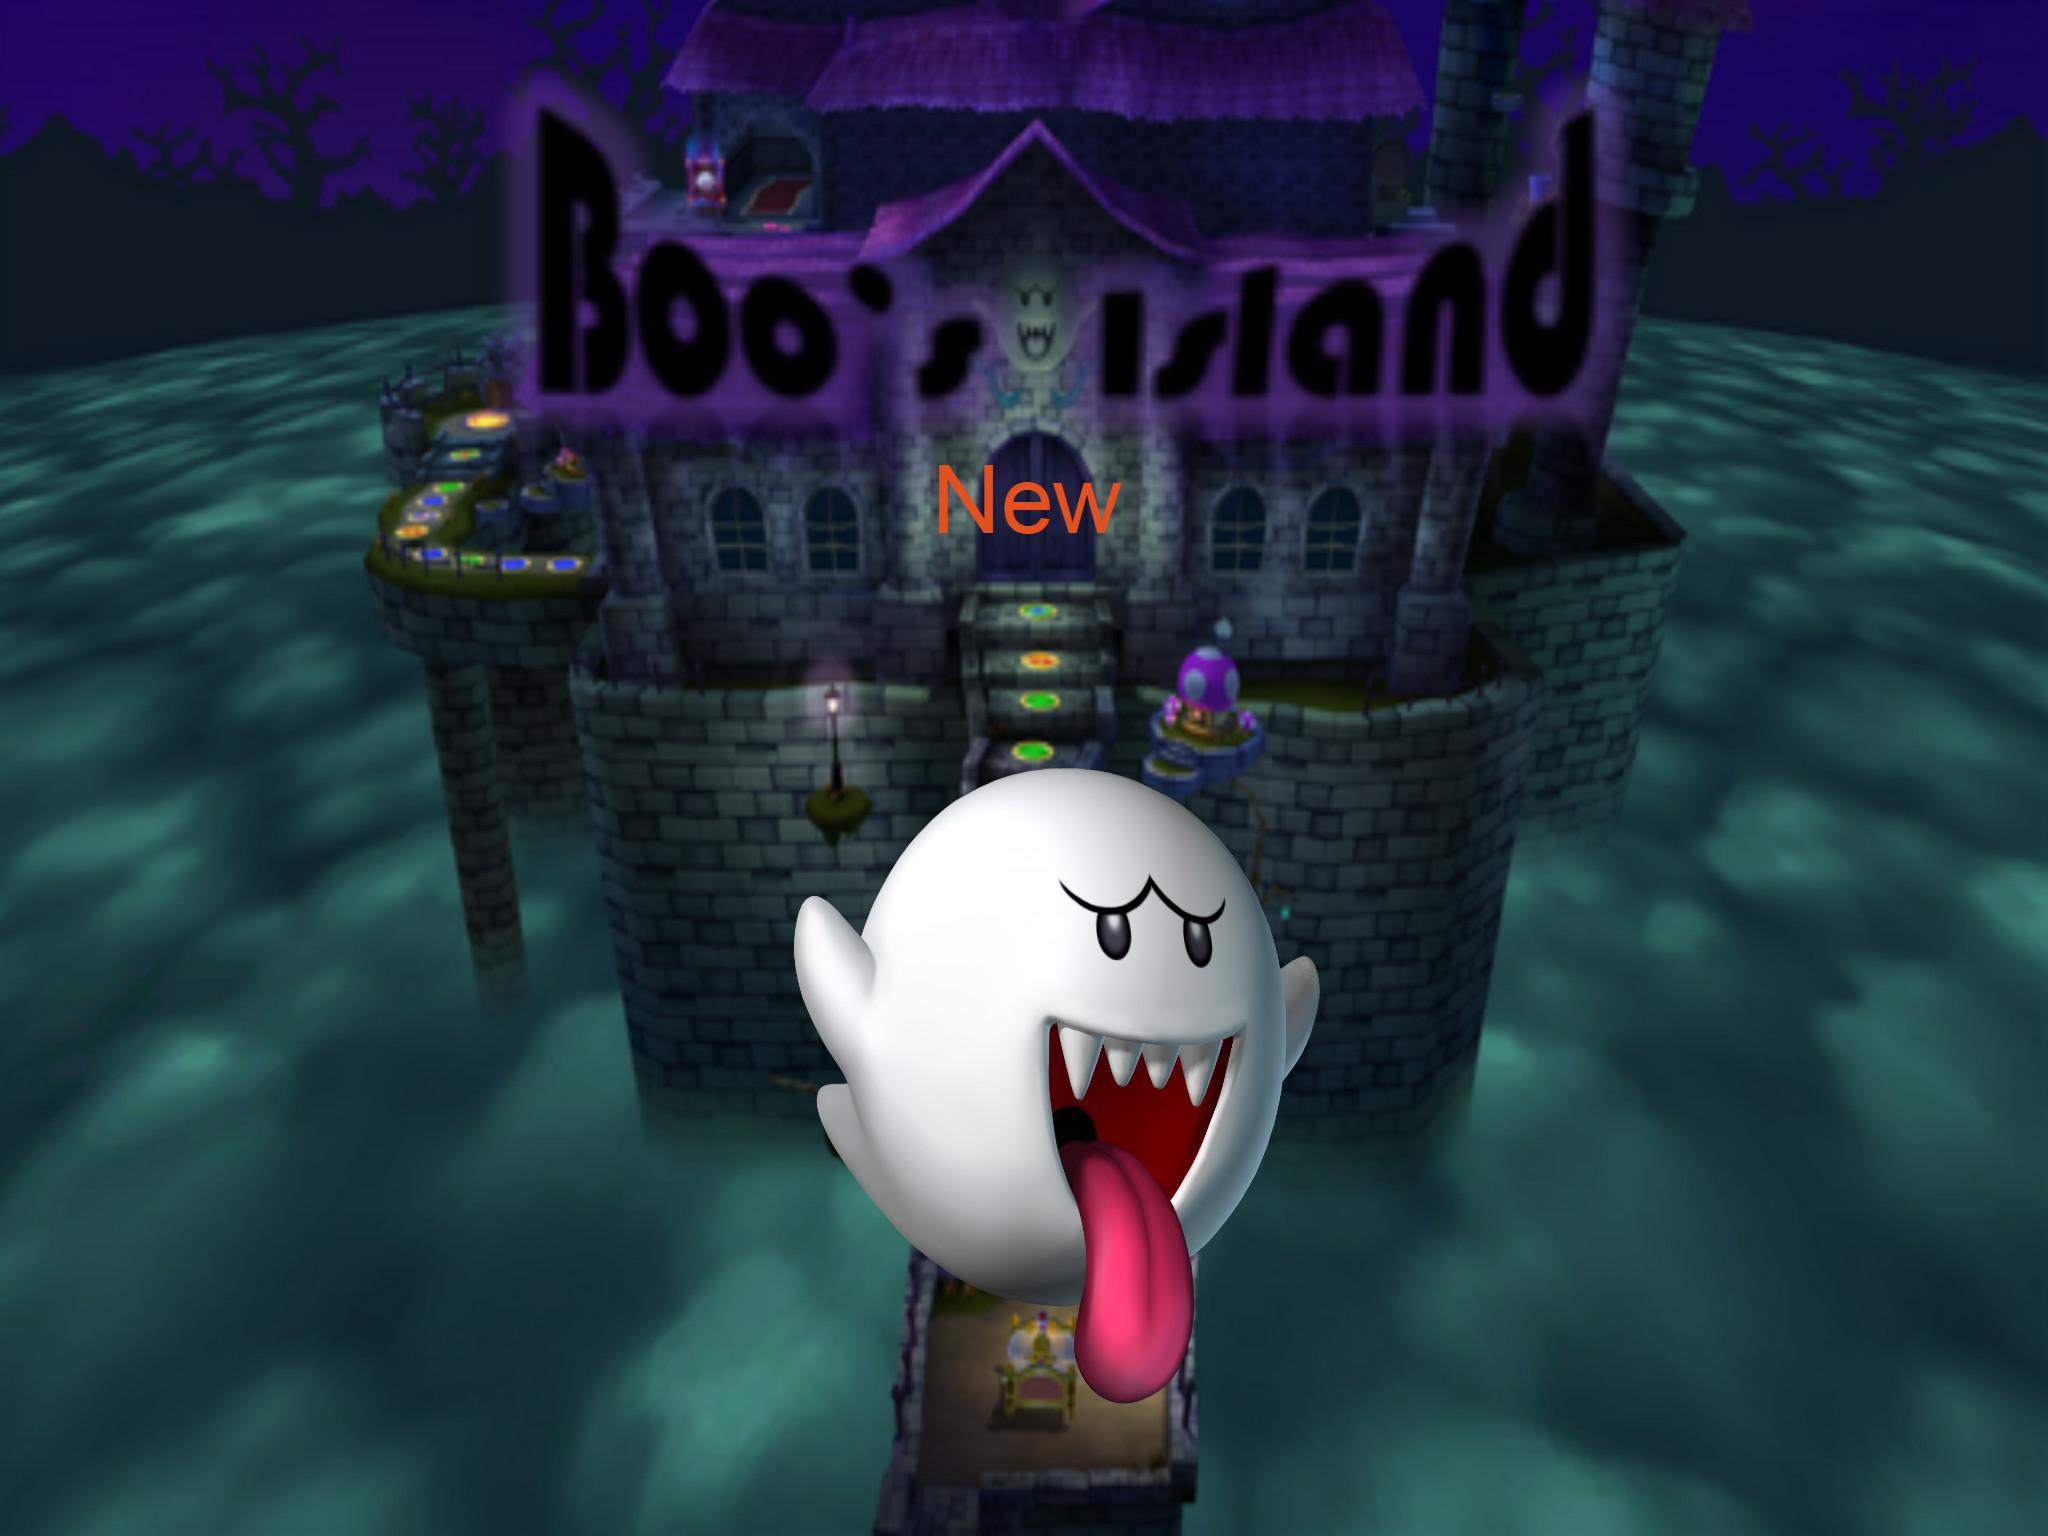 Boo's Island New